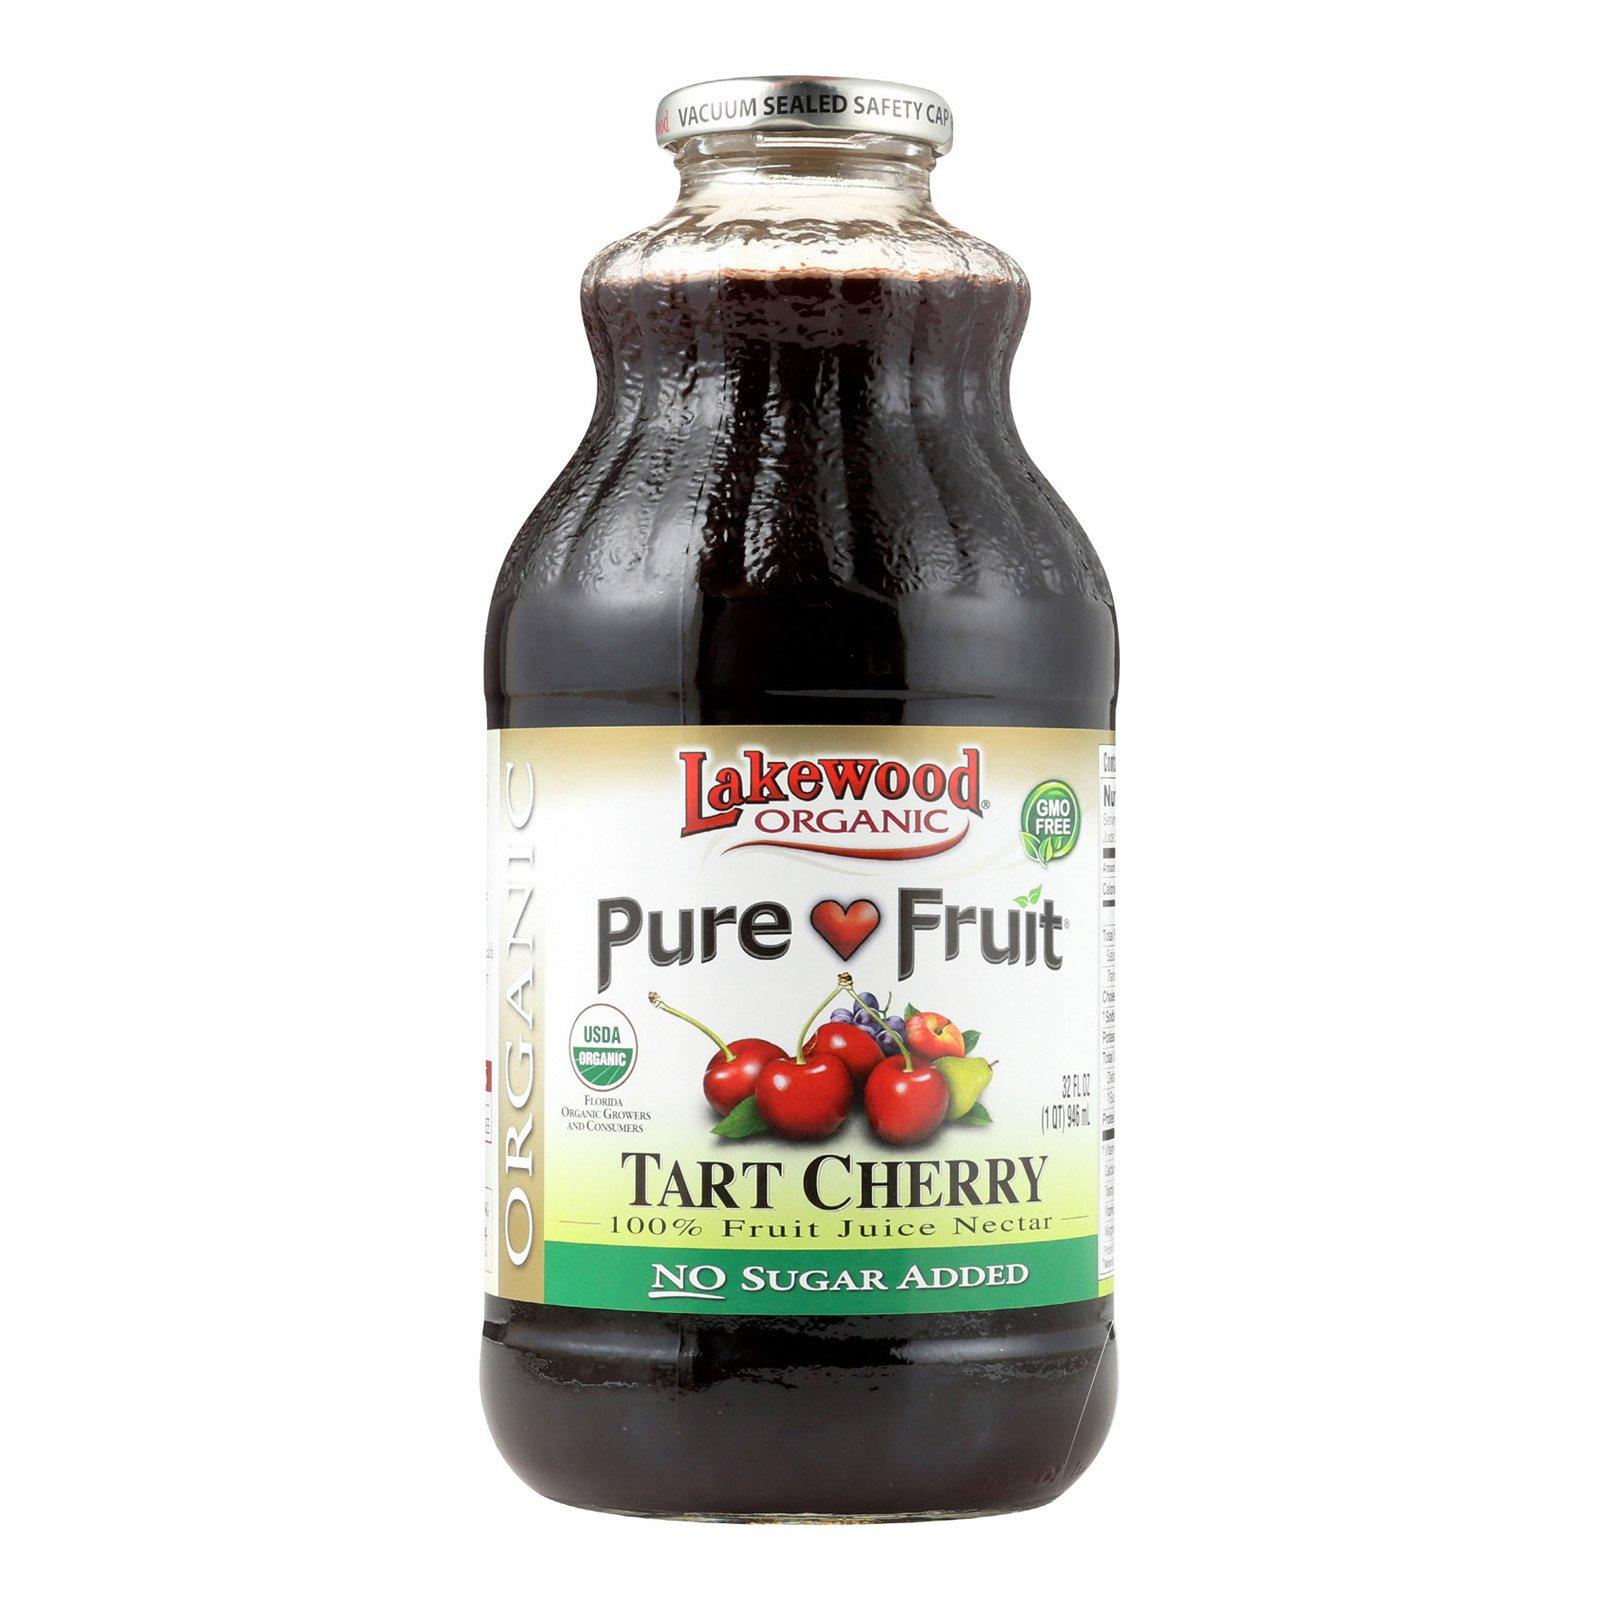 Lakewood Pure Organic Tart Cherry - Cherry - Case of 12 - 32 Fl oz.